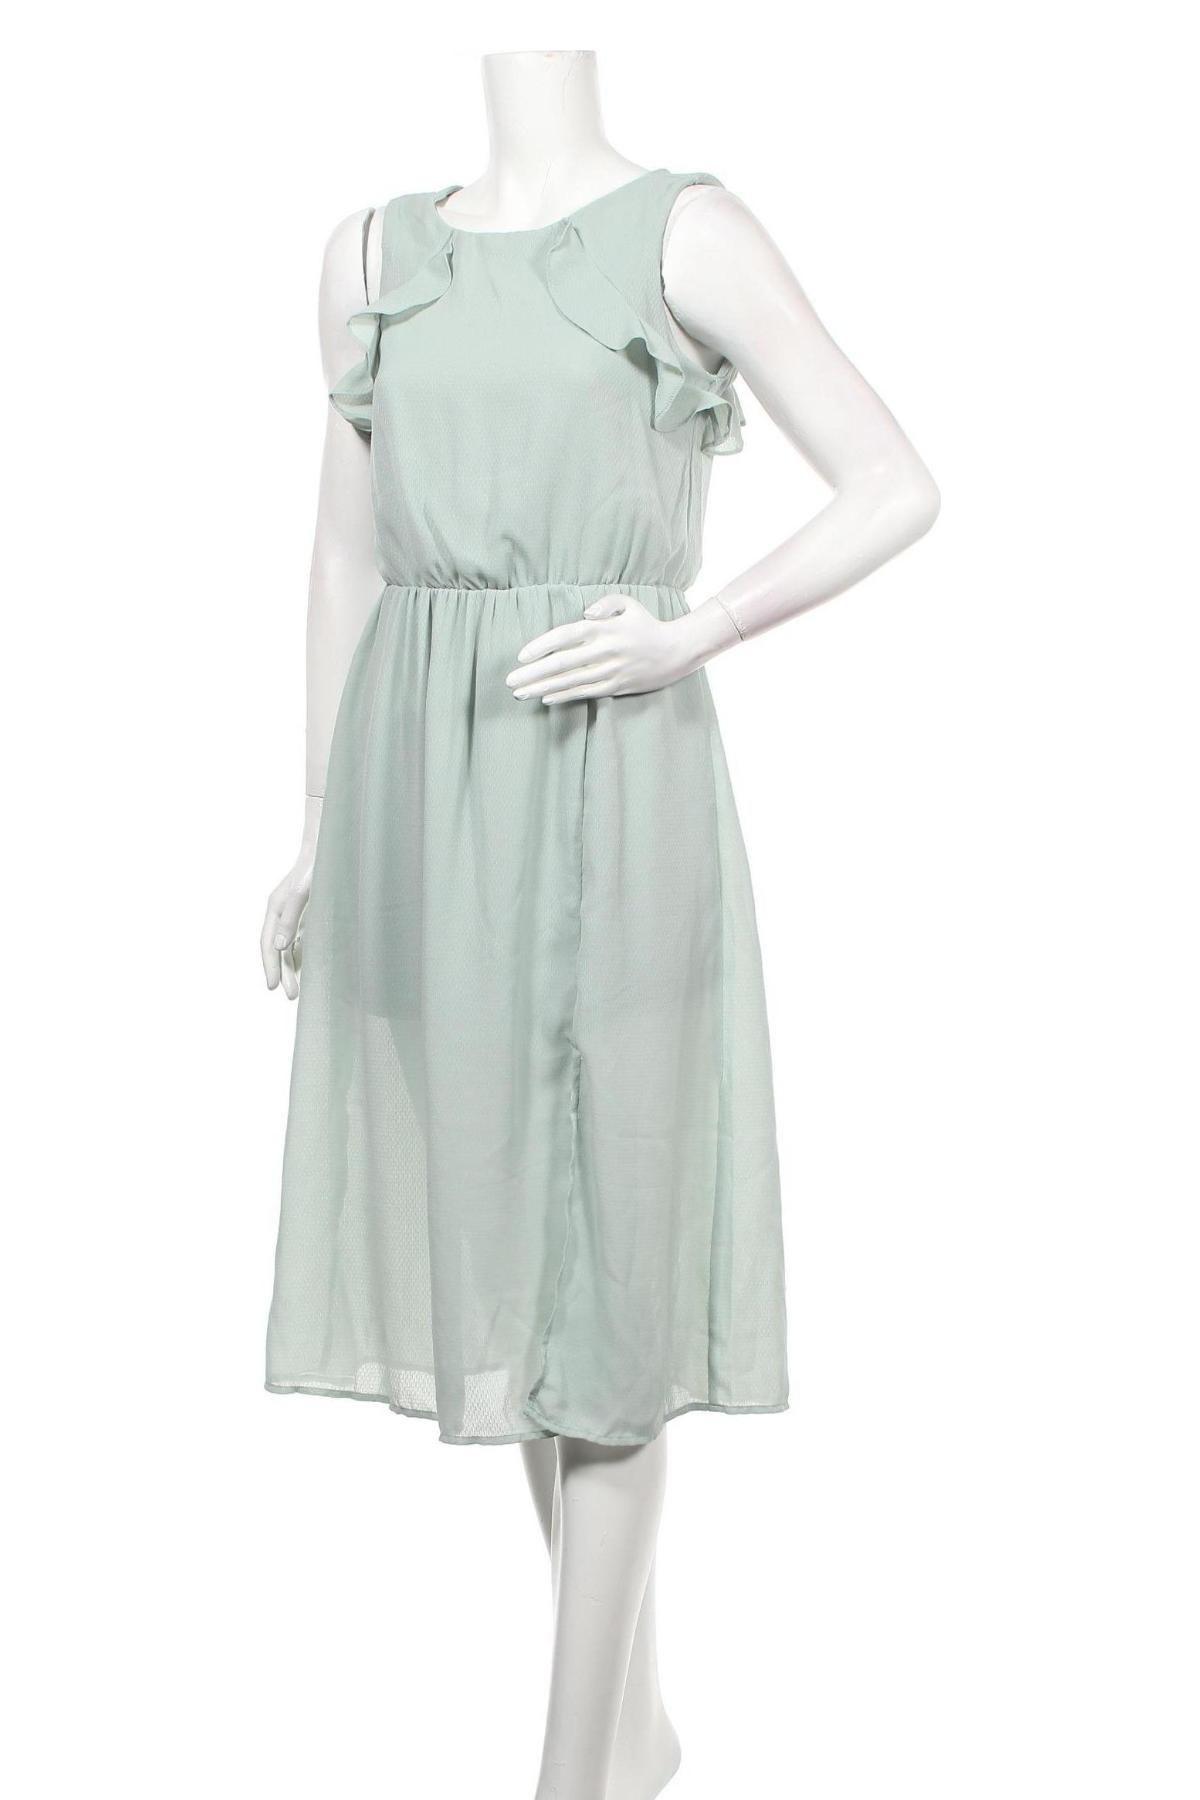 Рокля Vero Moda, Размер M, Цвят Зелен, Полиестер, Цена 57,00лв.